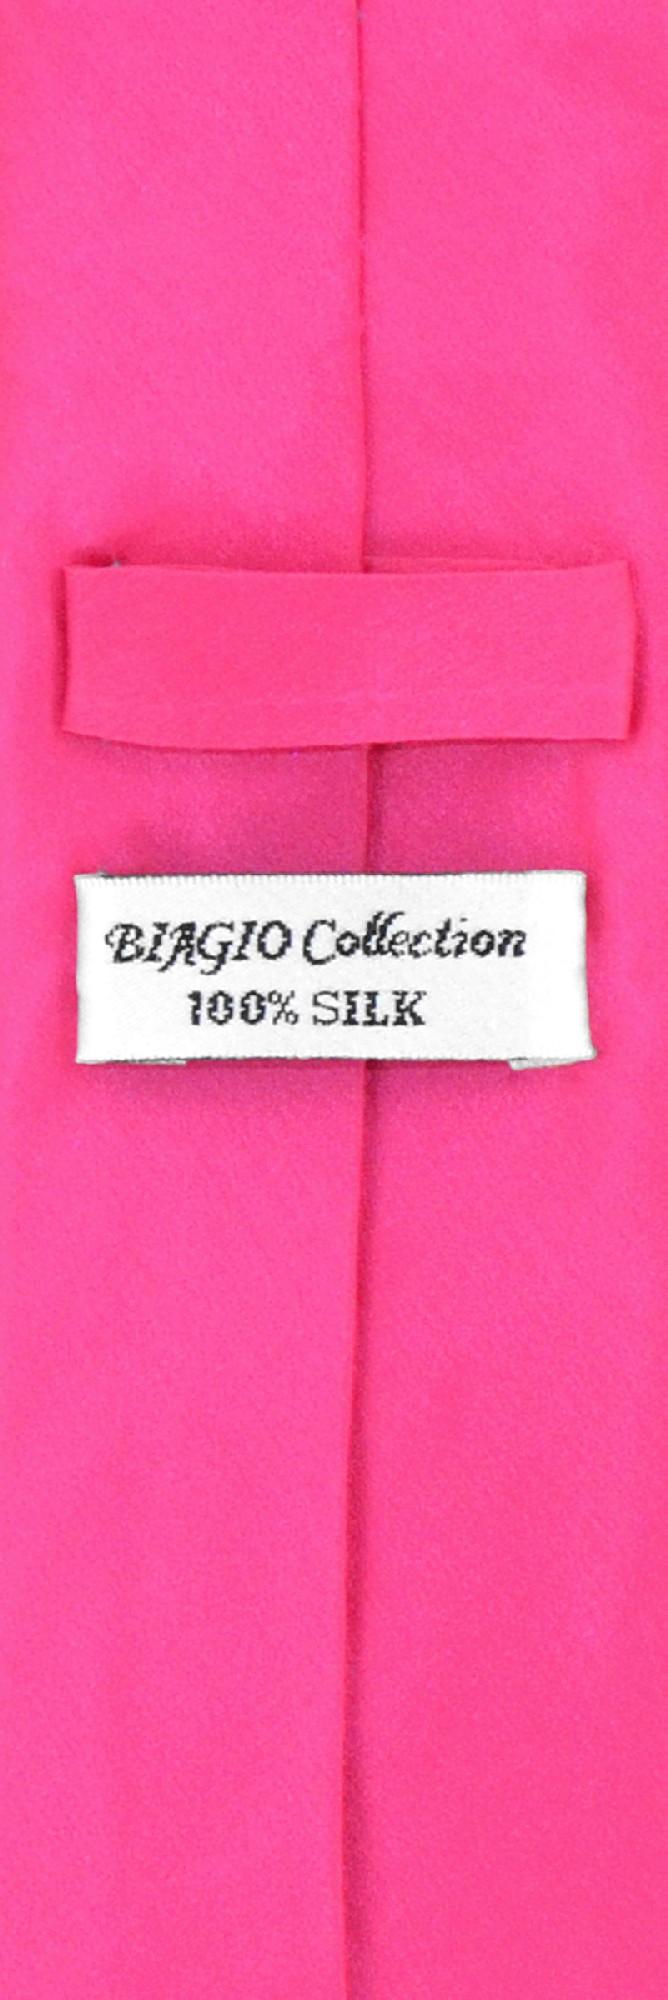 Hot Pink Fuchsia Skinny Tie Handkerchief Set | Silk Tie Hanky Set